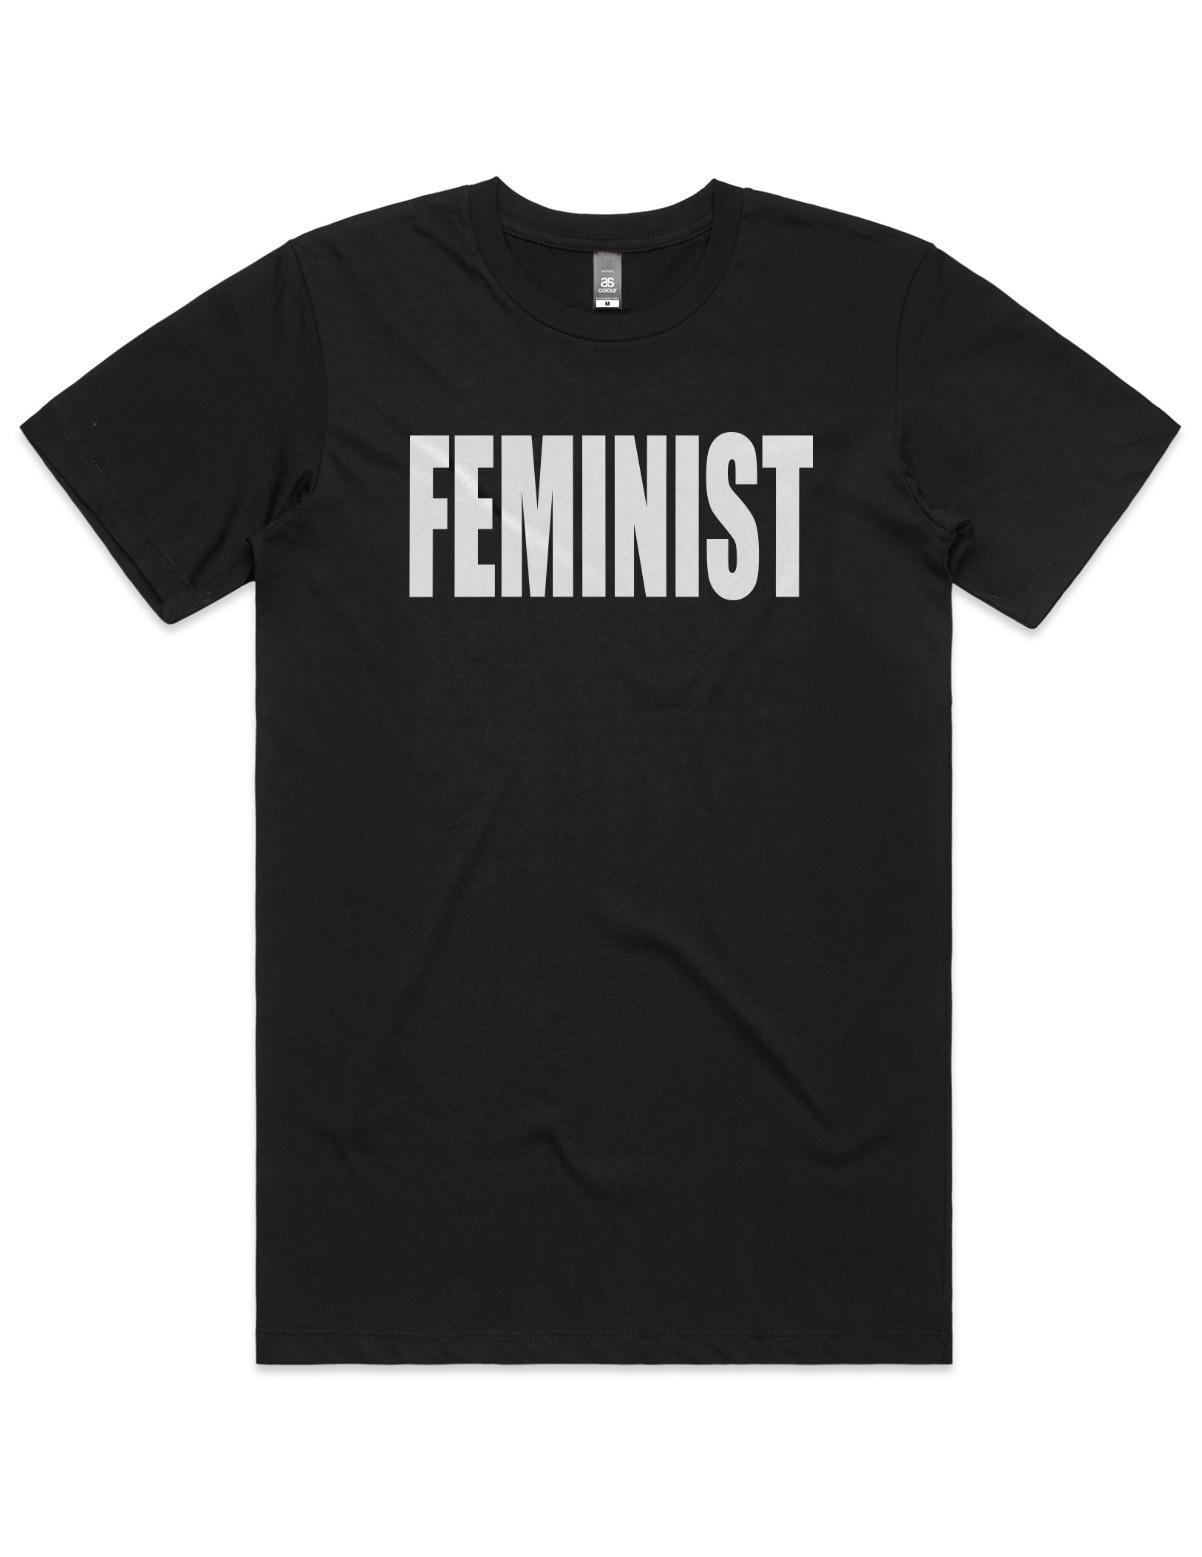 Feminist T-Shirt Black (Large, Unisex)